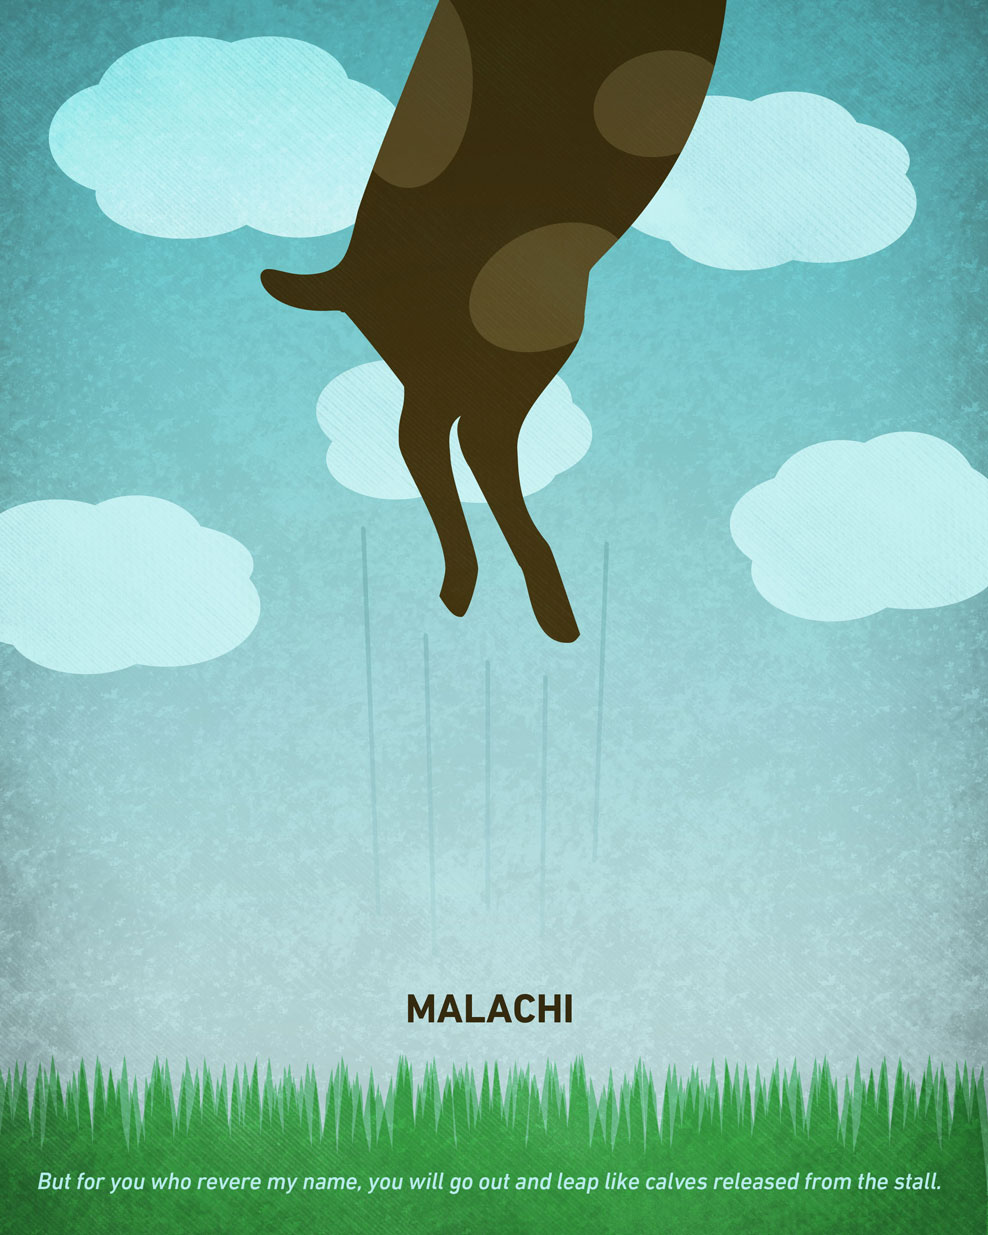 39-Malachi_988.jpg